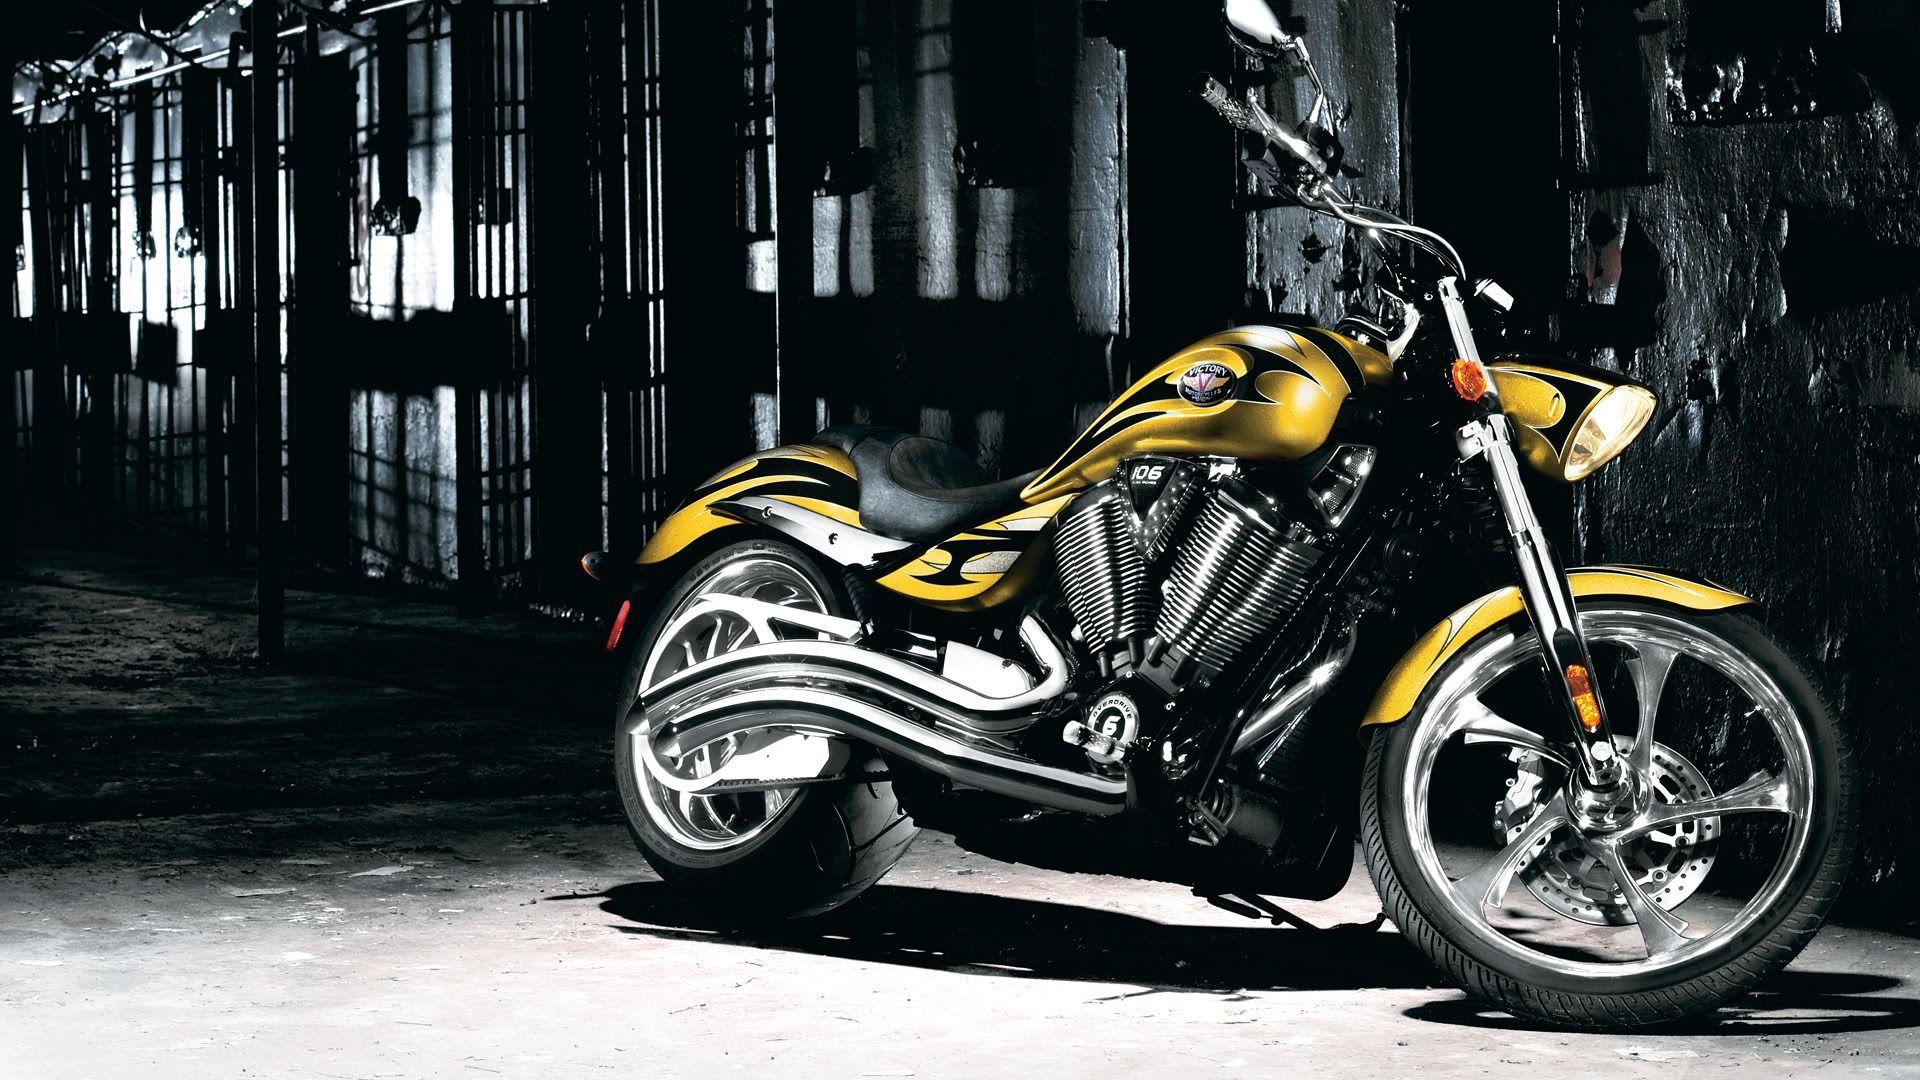 Pix For Victory Motorcycle Desktop Wallpaper Motorcycle